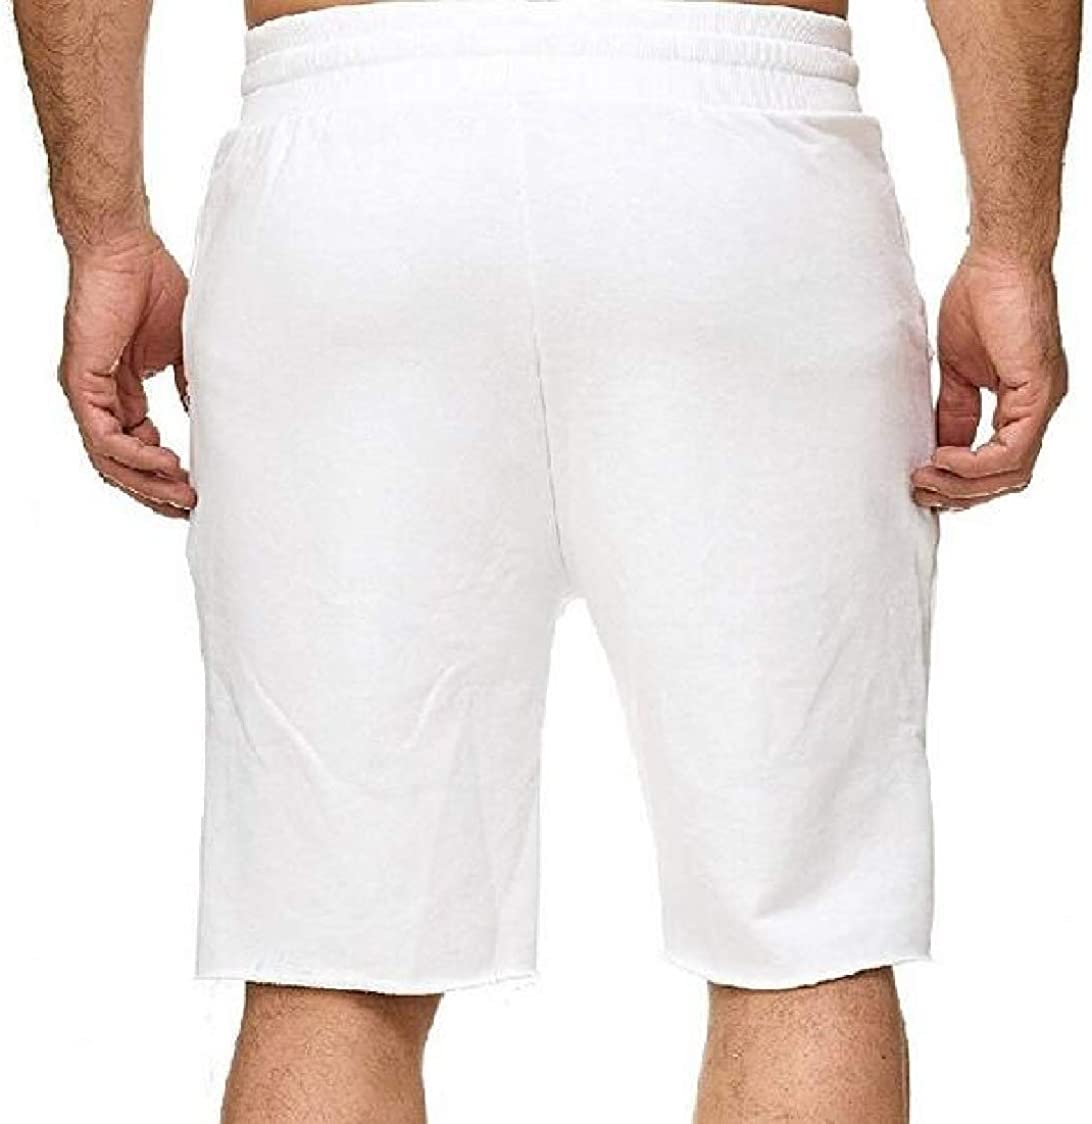 SELX Men Running Casual Beach Knee Length Drawstring Shorts Sweatpants